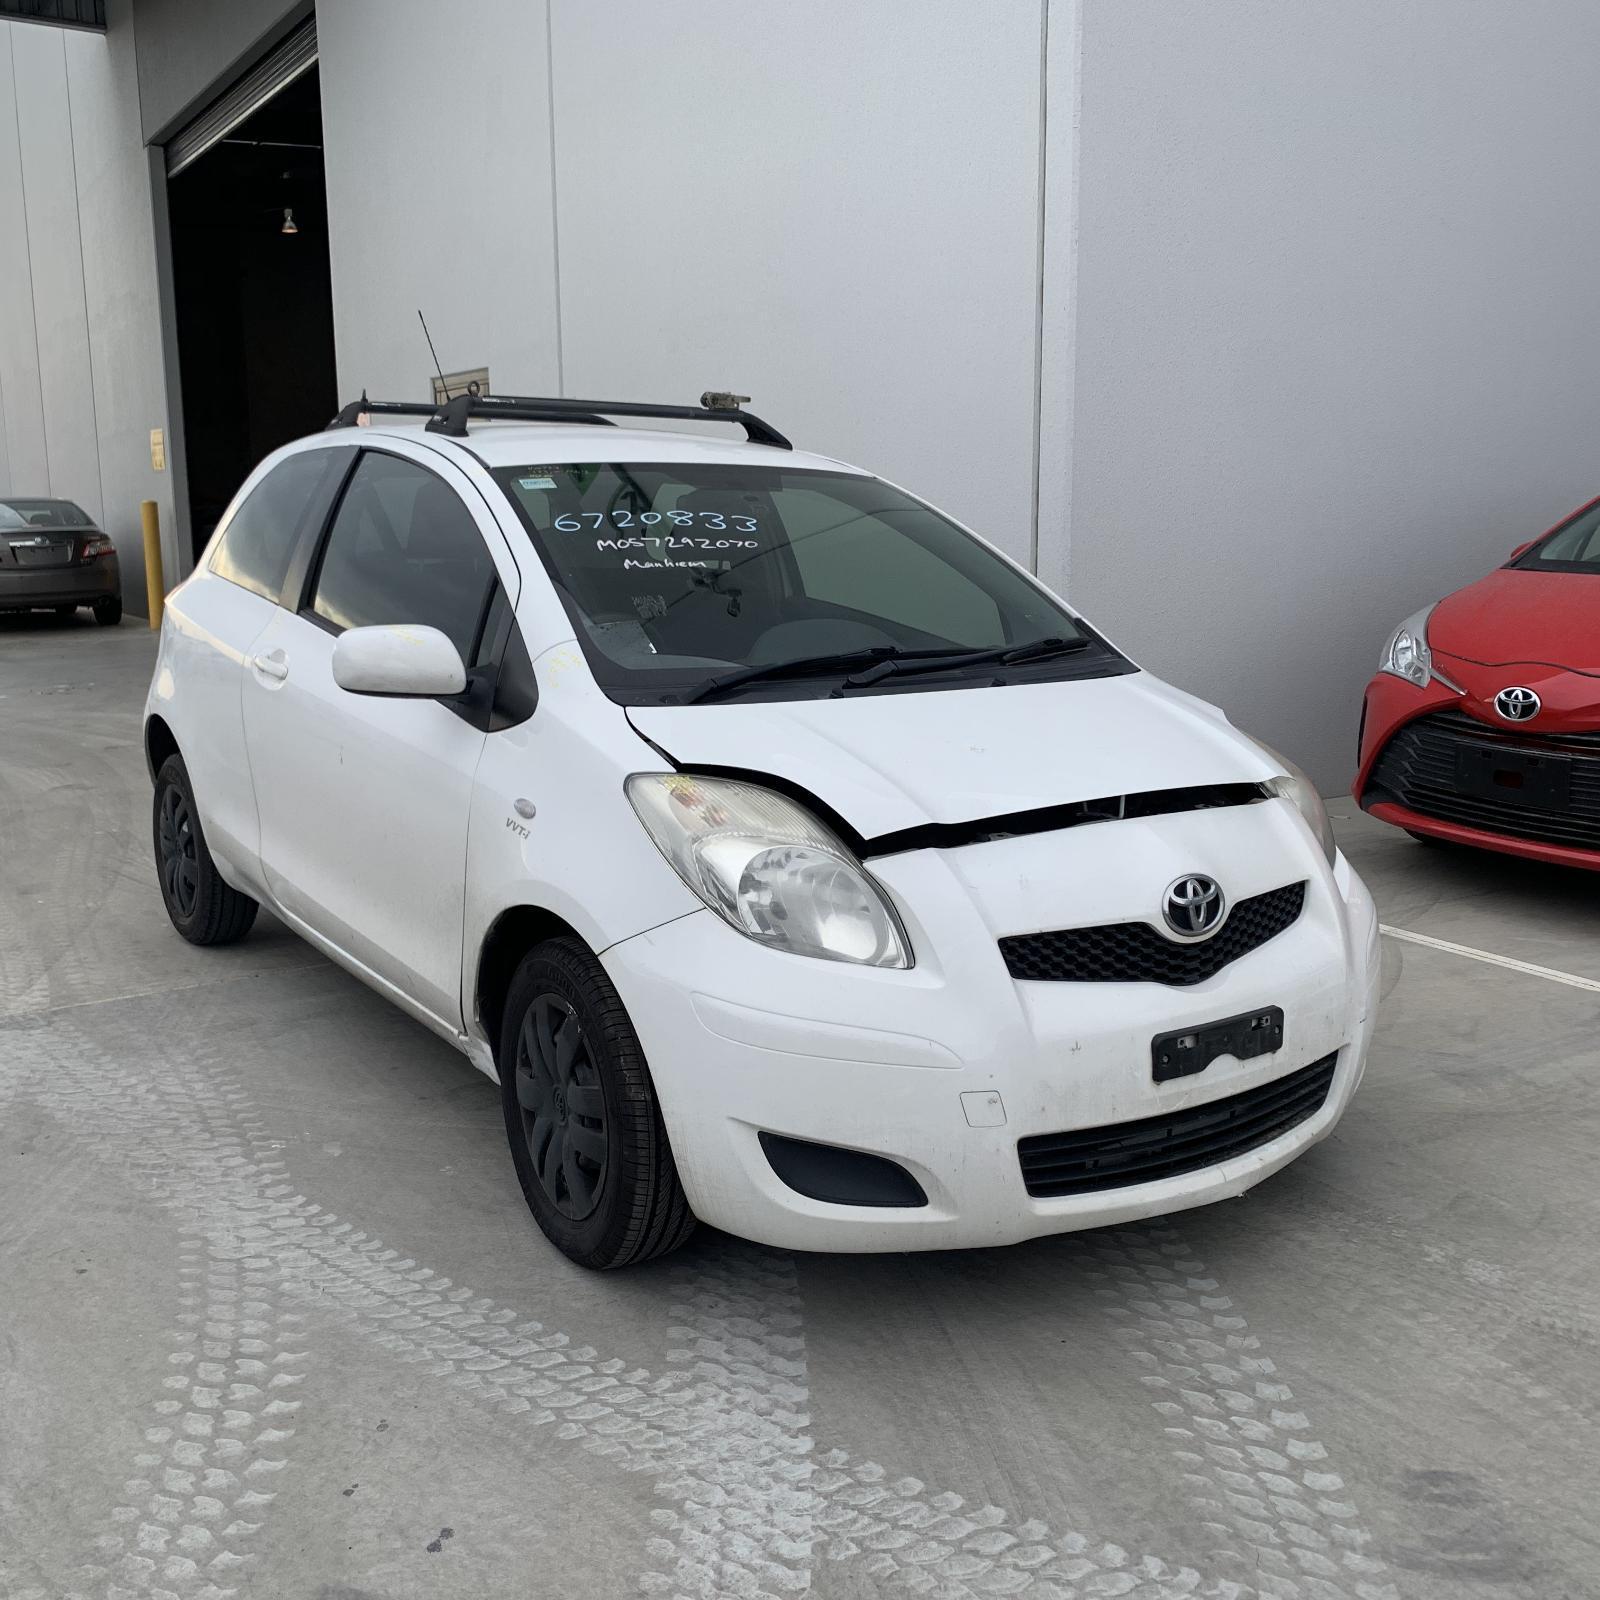 Toyota YARIS 3DOORS 2NZ-FE 1.3L Engine Automatic FWD Transmission 10/05 - 10/11